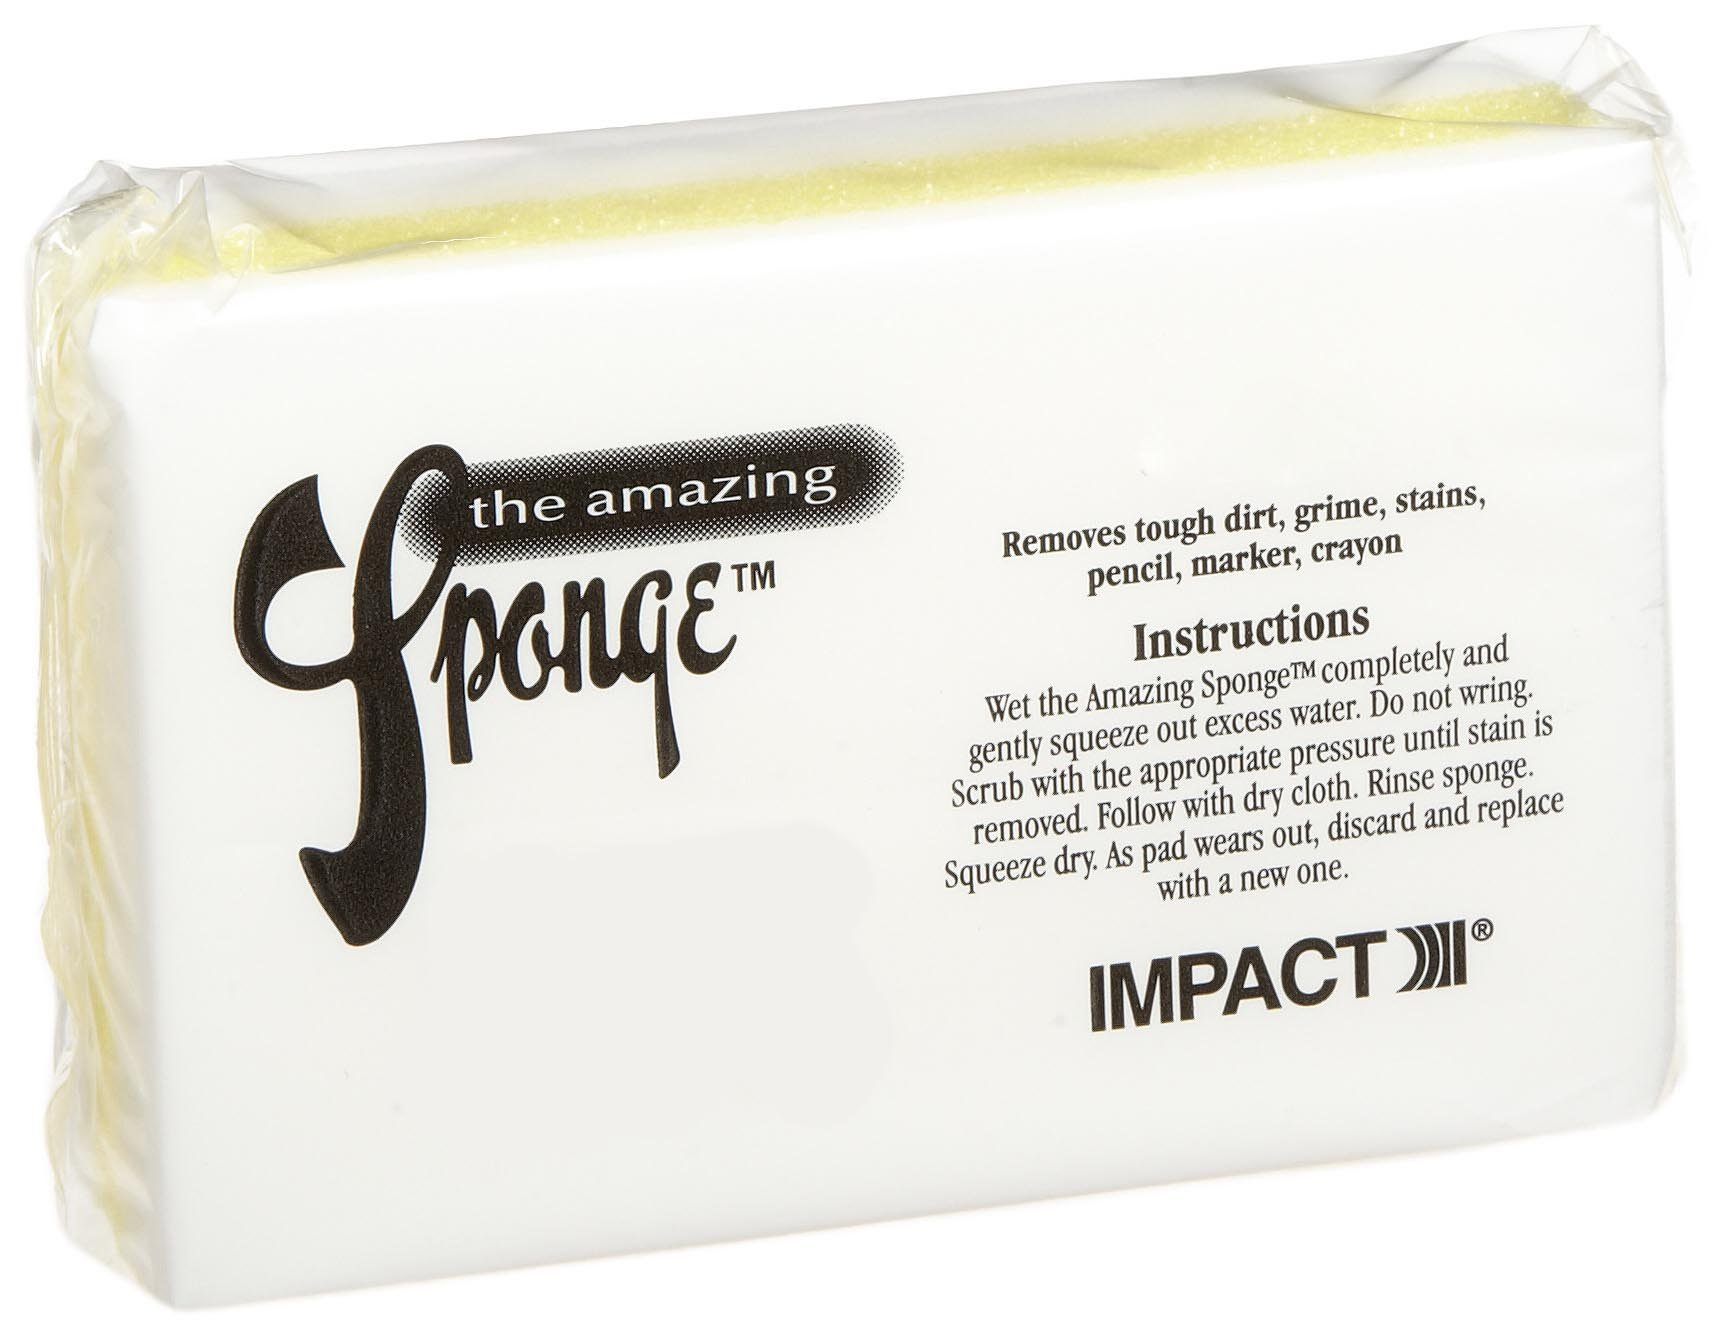 Impact 7150 Yellow White The Amazing Sponge Magic Eraser Pad, 4-1/2'' Length x 2-3/4'' Width x 1-1/2'' Height (Case of 30)